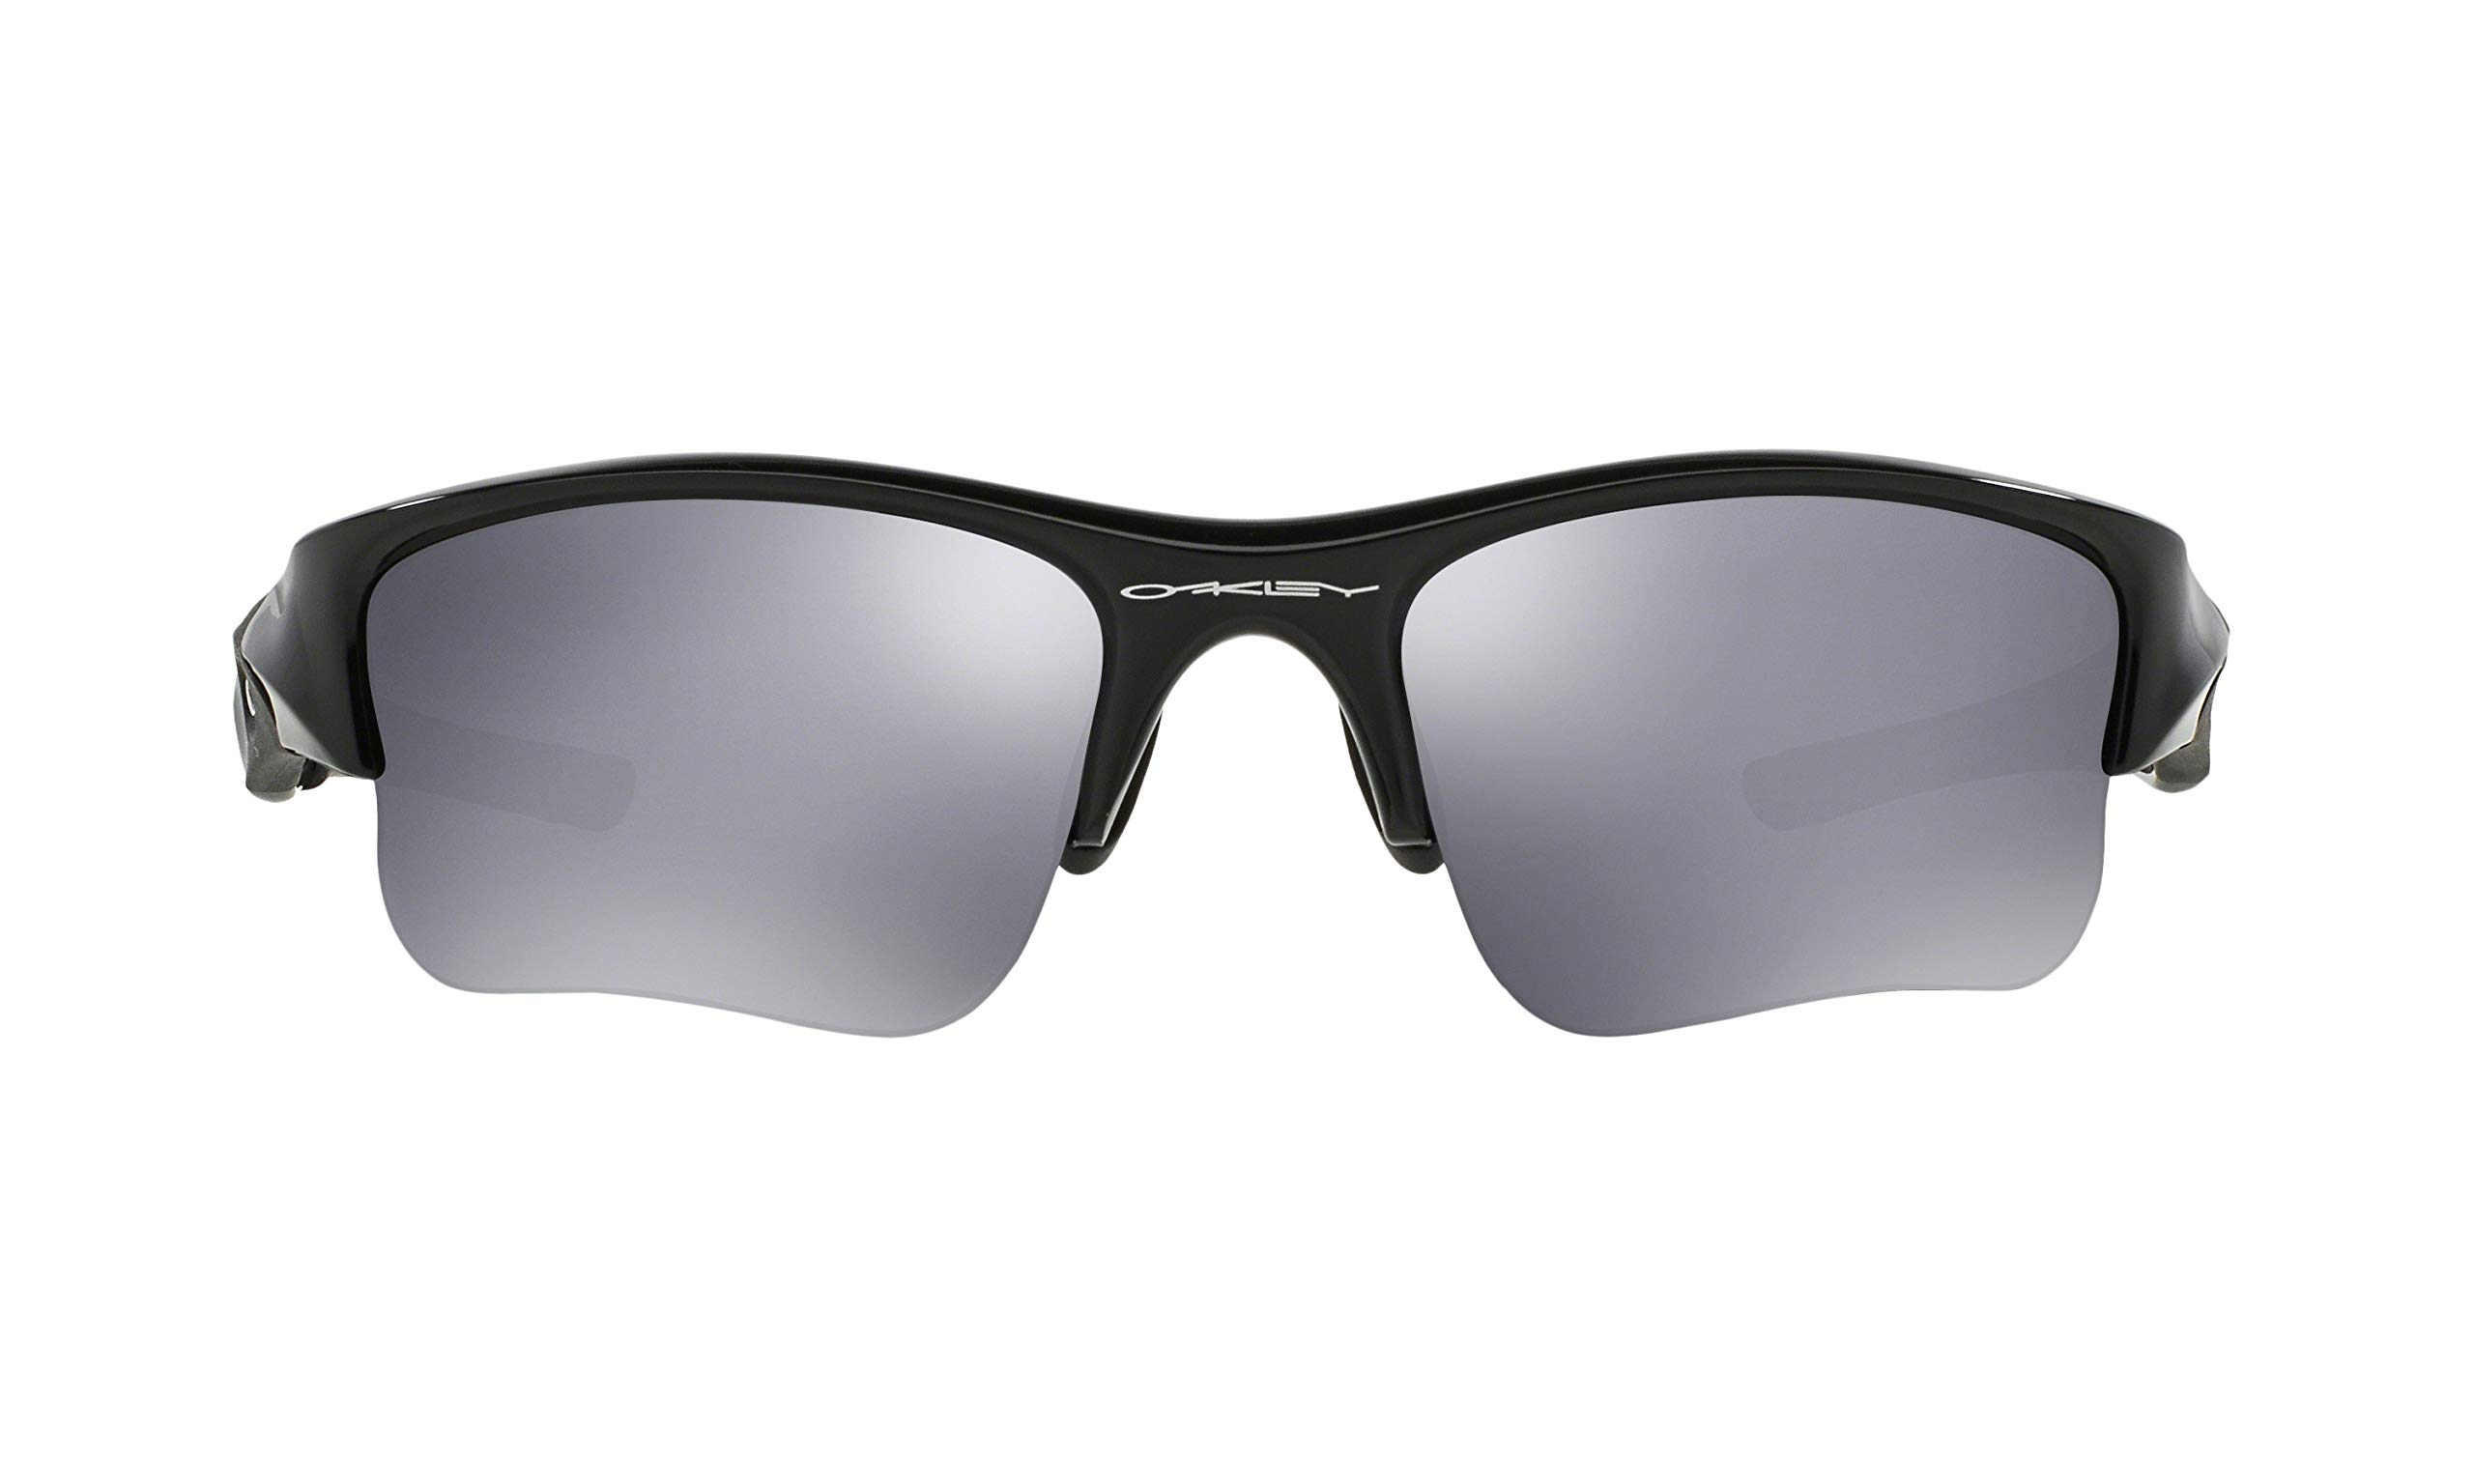 Oakley Flak Jacket XLJ Sunglasses (Jet Black Frame, Black Iridium Lens) with Lens Cleaning Kit and Ellipse O Carbonfiber Hard Case by Oakley